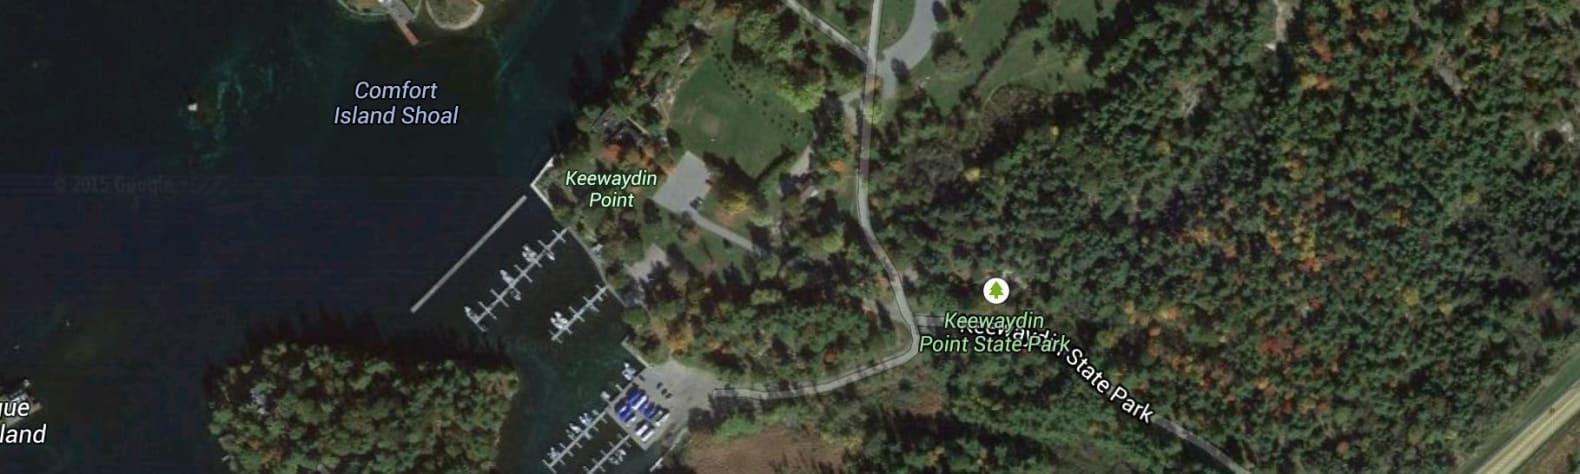 Keewaydin State Park